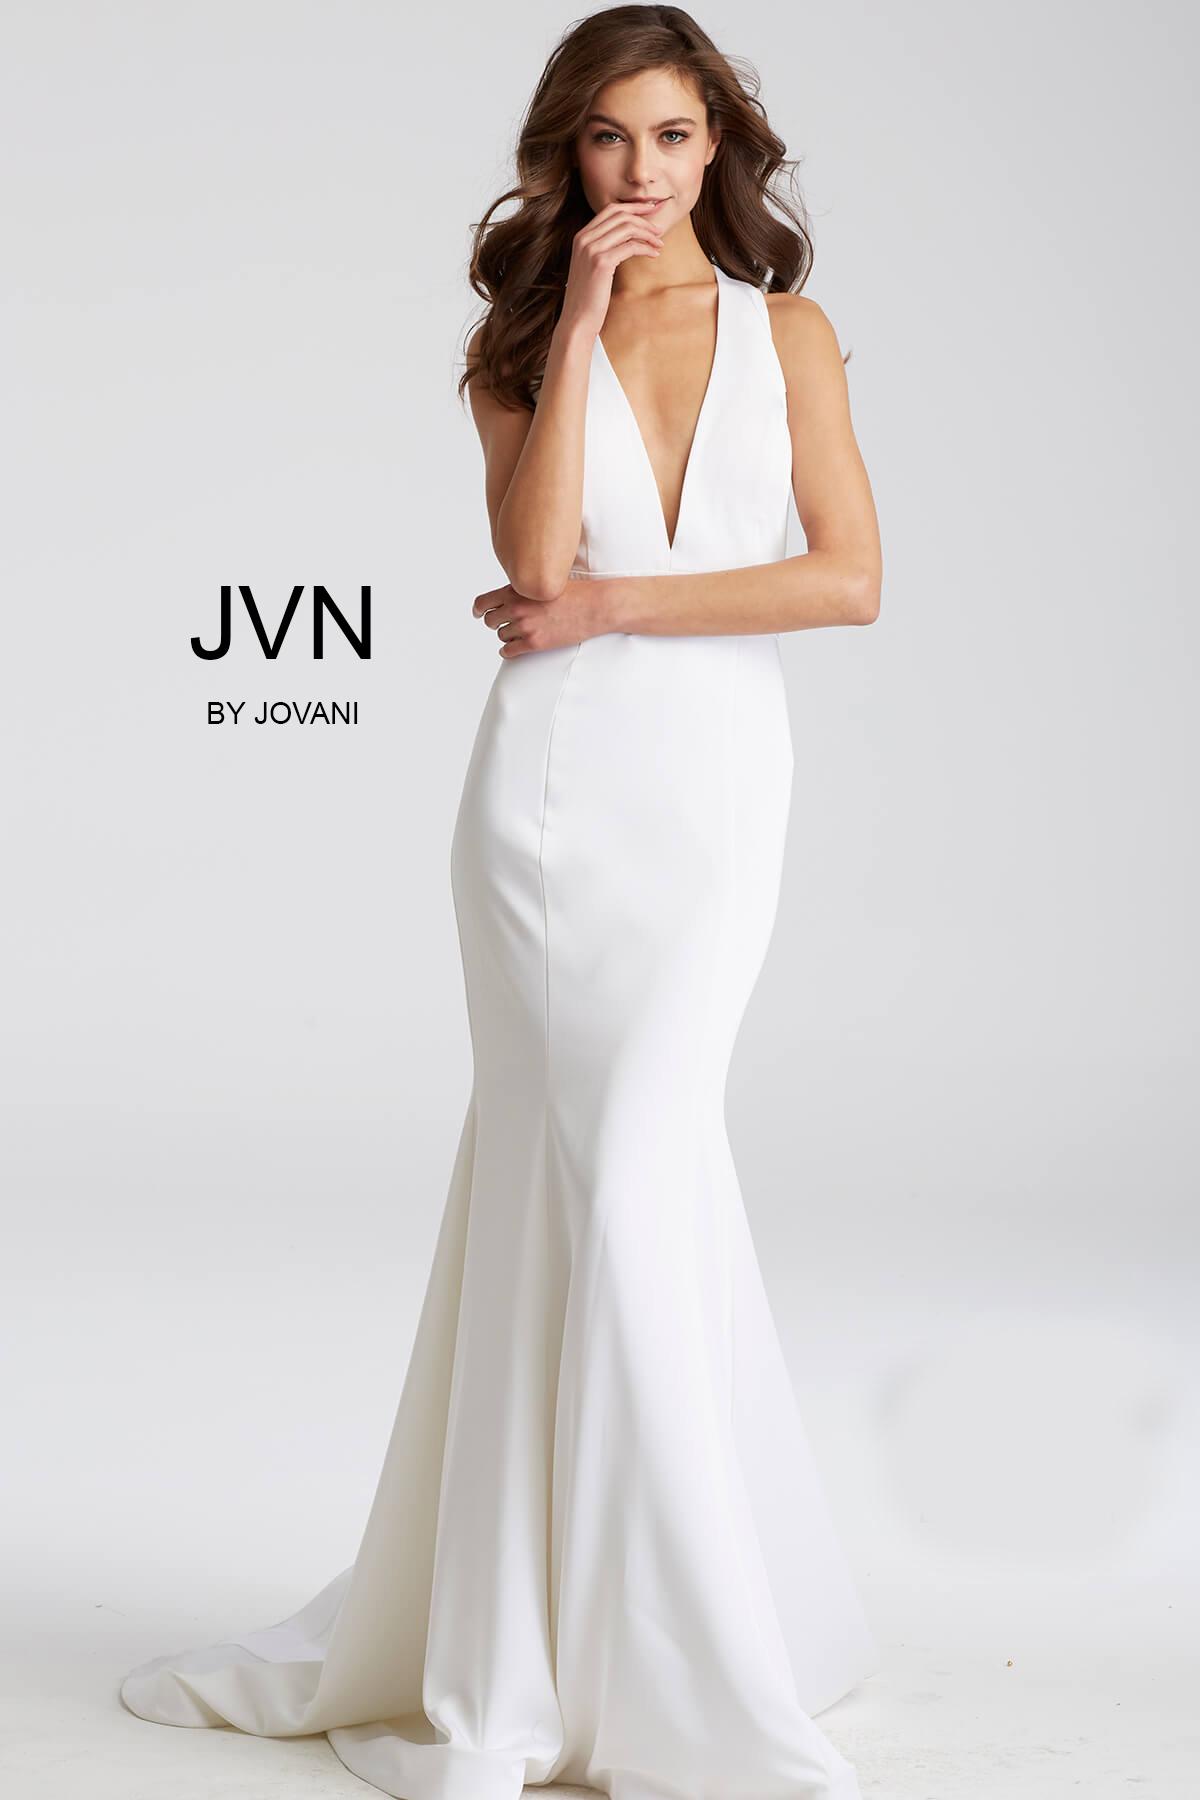 c3774355958 Jovani Dresses For Rent - Gomes Weine AG